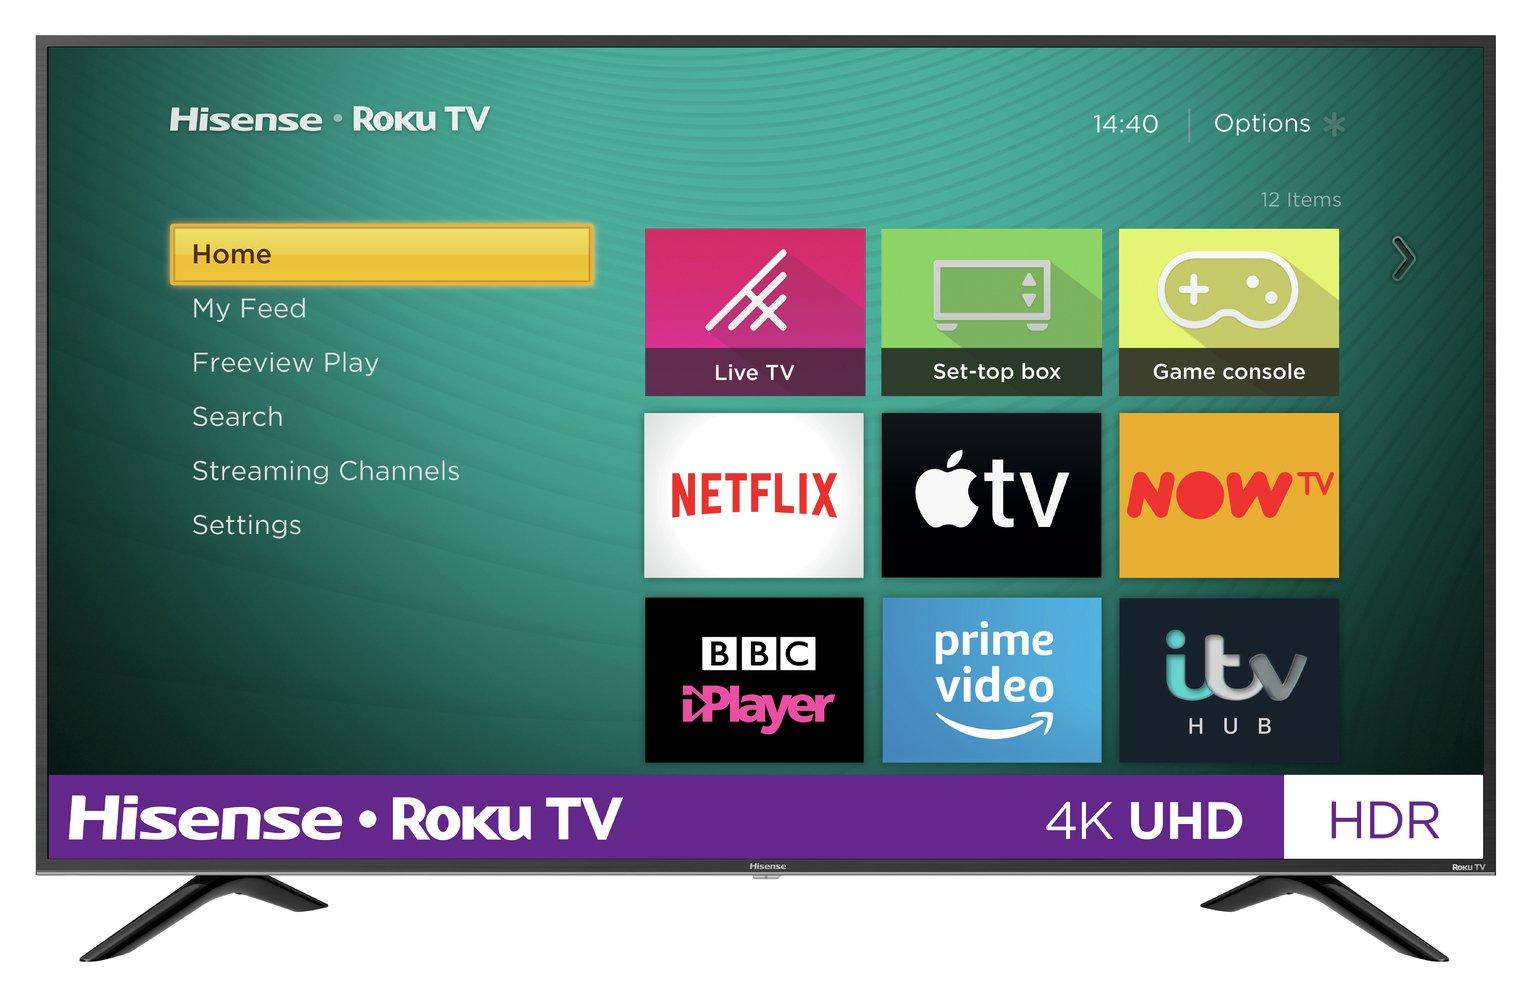 "Hisense Roku R43B7120UK 43"" - £249 / R50B7120UK 50"" - £299 / R55B7120UK 55"" - £349 / R65B7120UK 65"" - £499 4K Ultra HDR Smart TVs @ Argos"